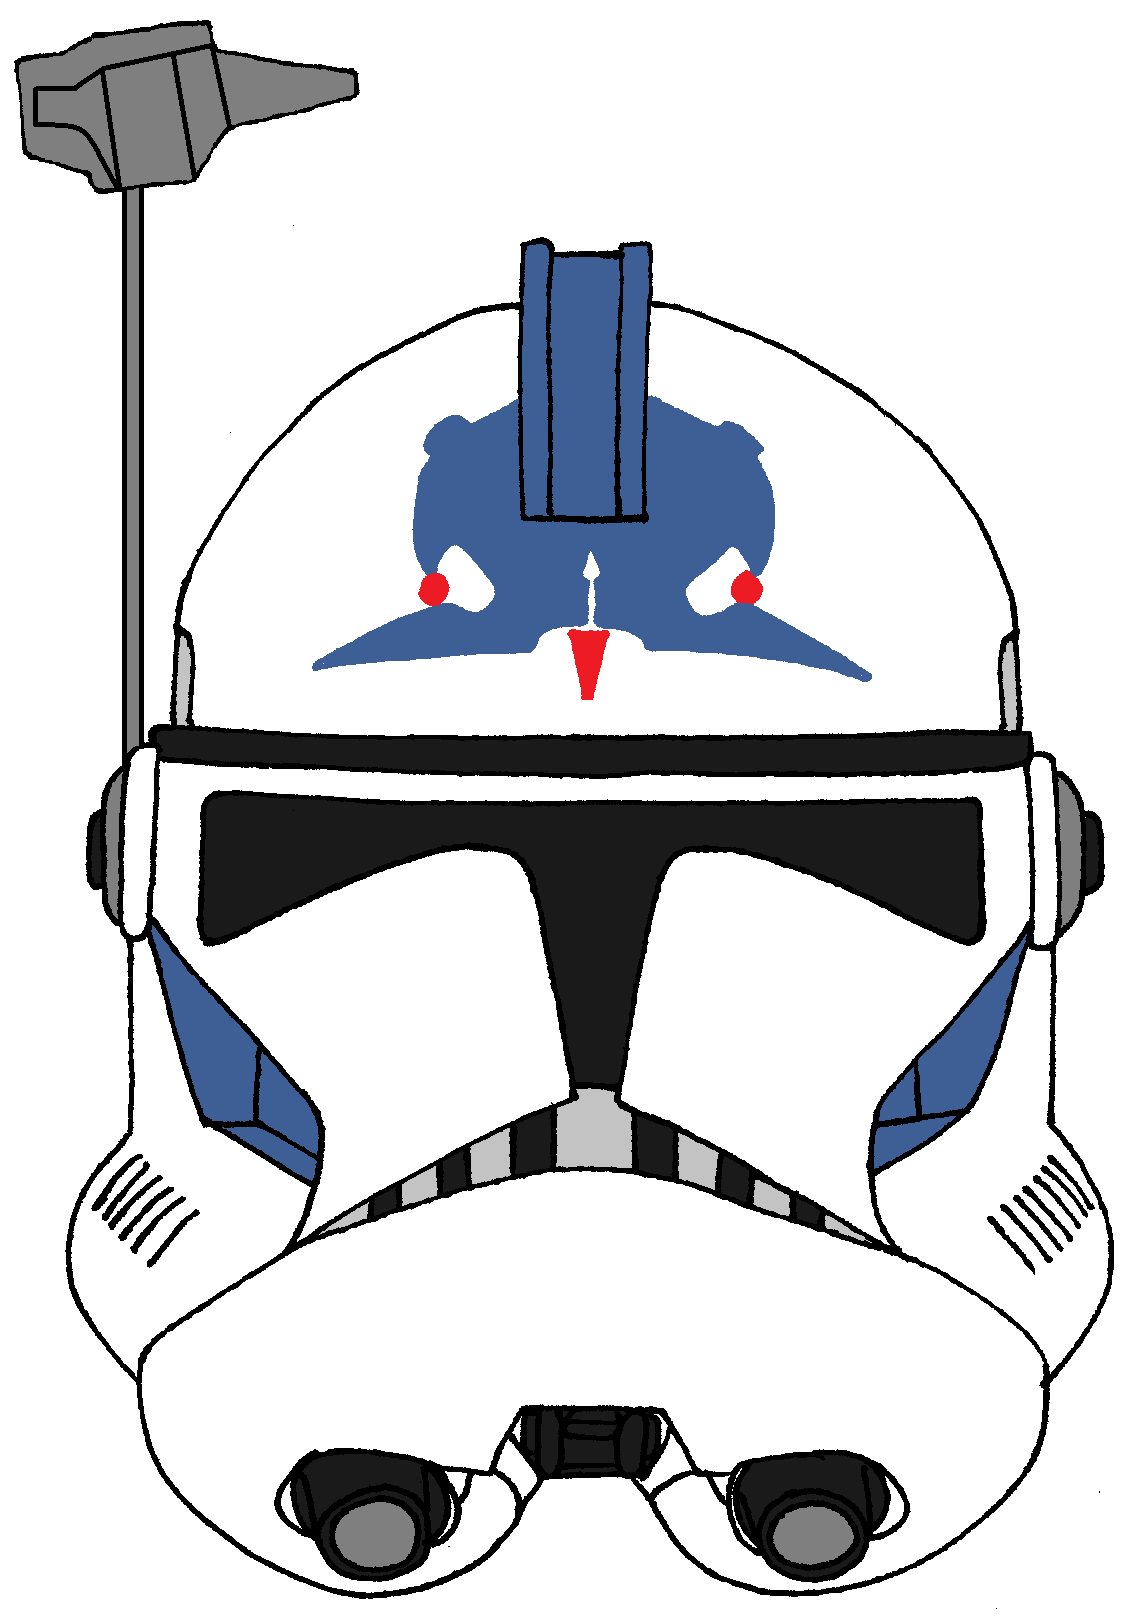 Arc Trooper Five S Helmet Star Wars Artwork Star Wars Art Star Wars Wallpaper